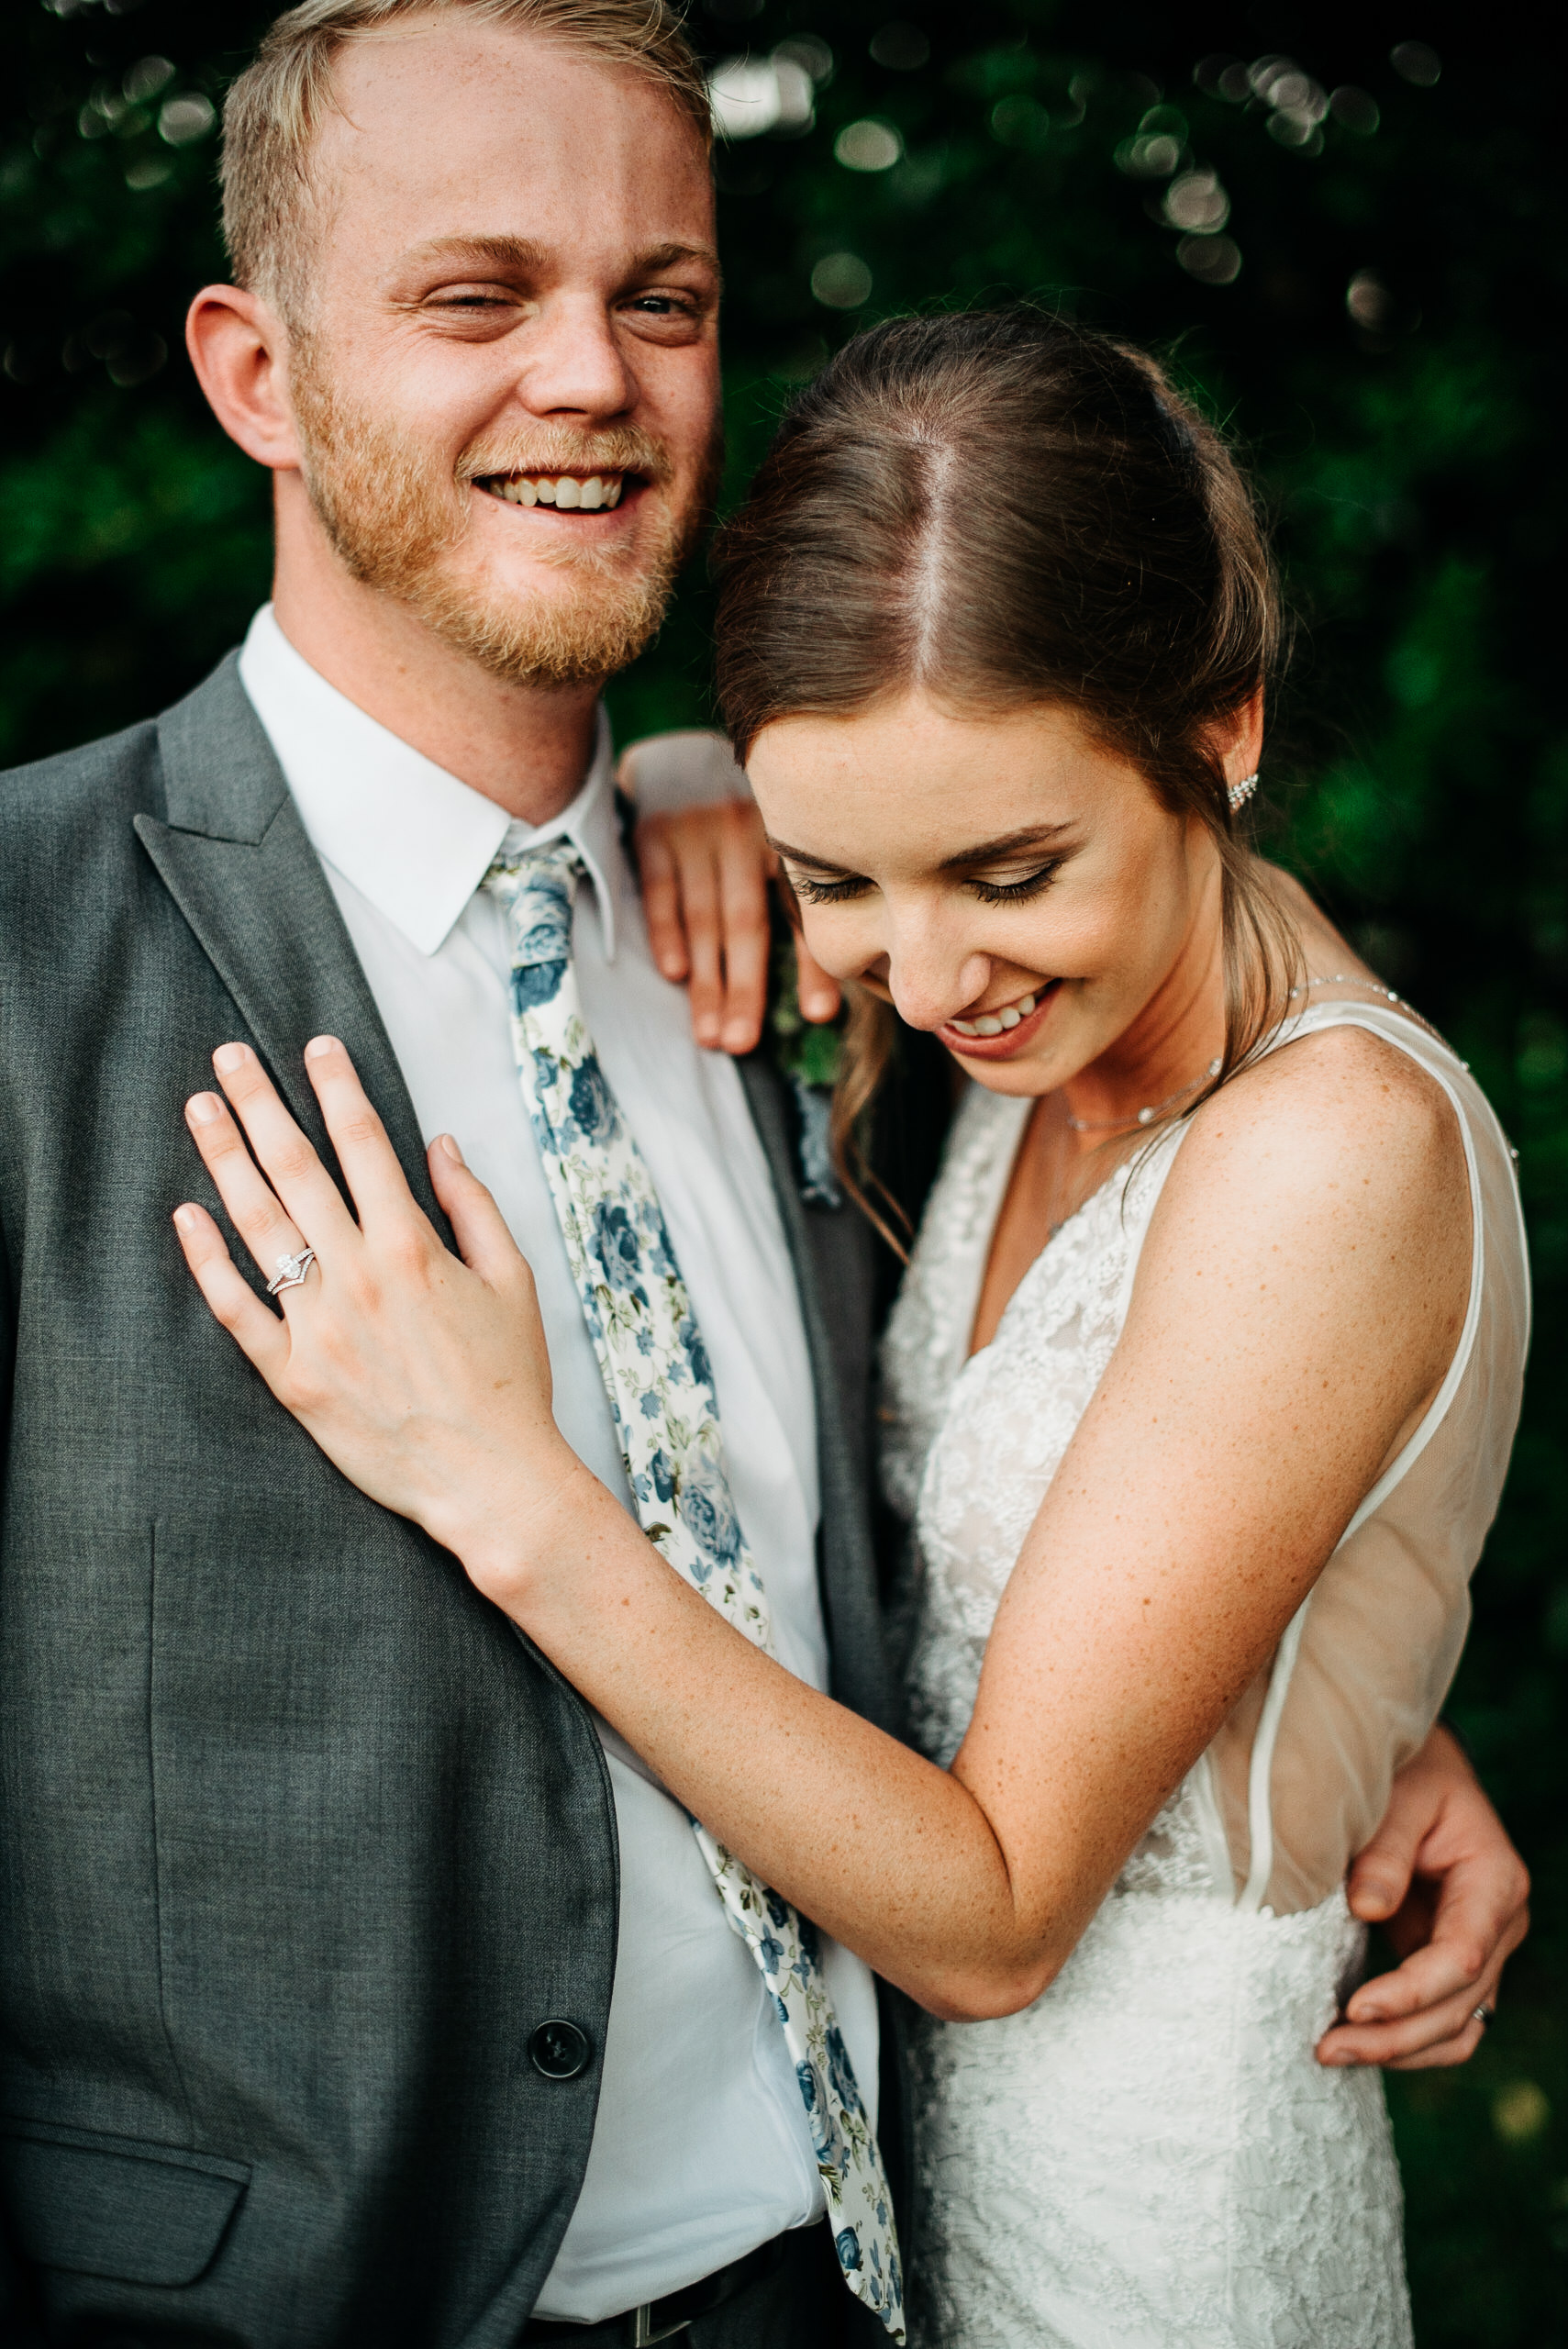 okc-wedding-photographer-coles-garden-wedding-okc-best-wedding-photographers-158.jpg